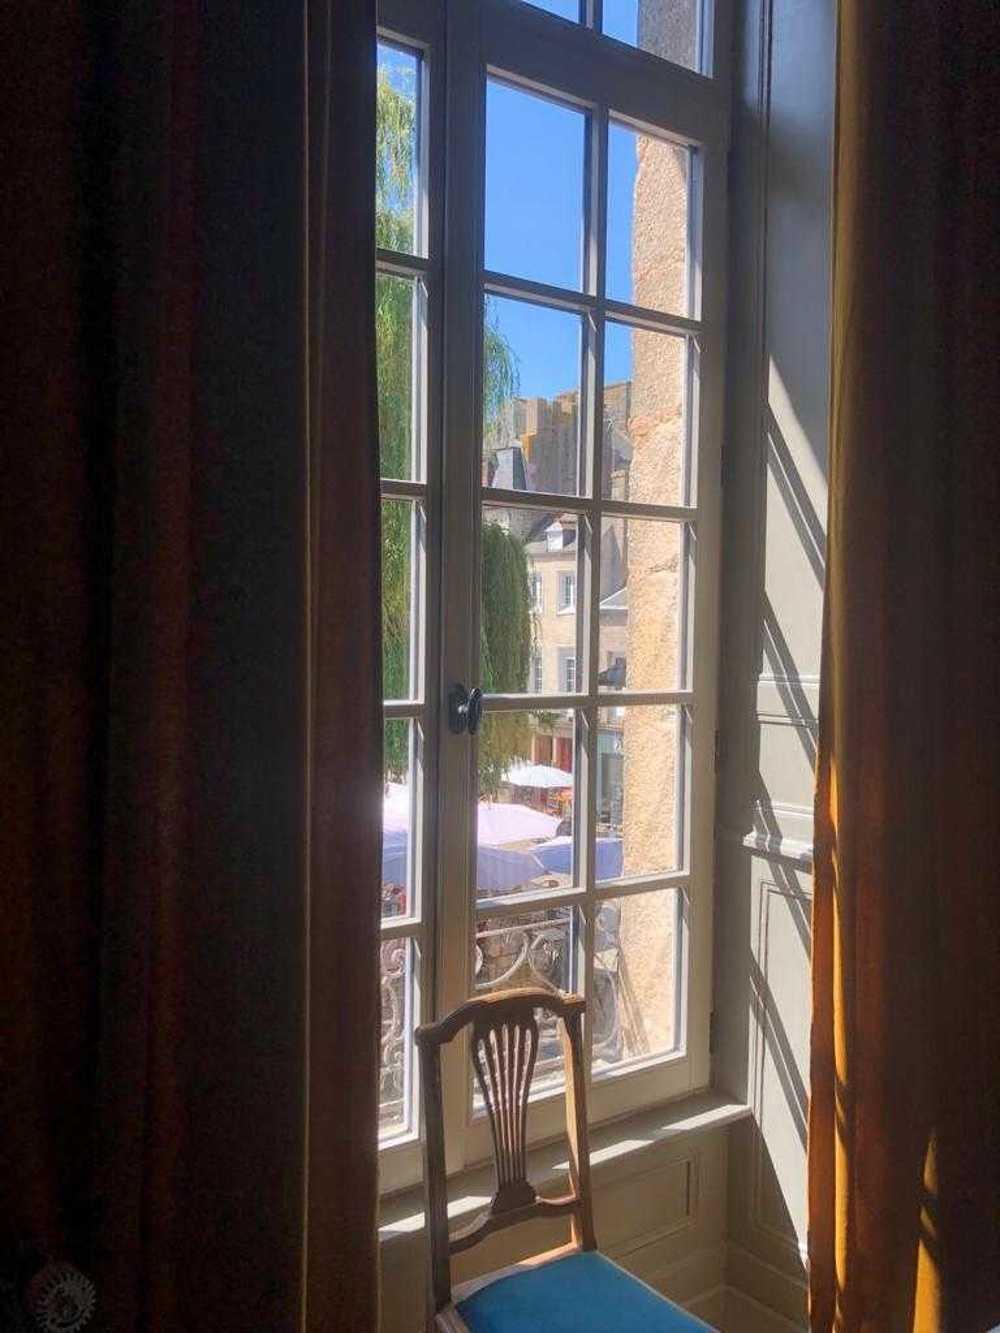 Installation de fenêtres en bois - Dinan (22) whatsappimage2020-07-08at01.46.332